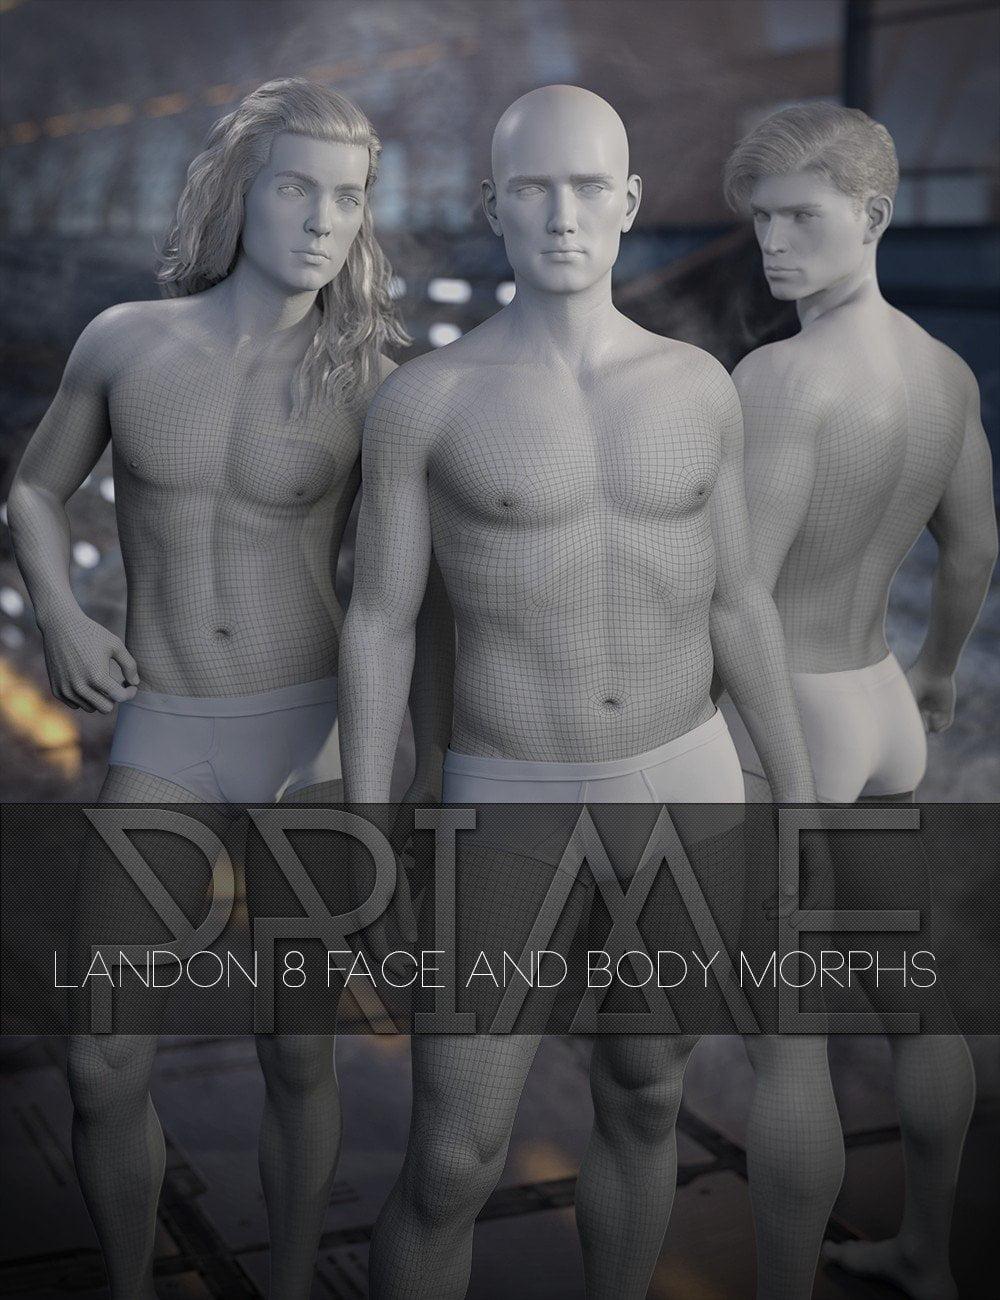 Prime Landon 8 Morphs